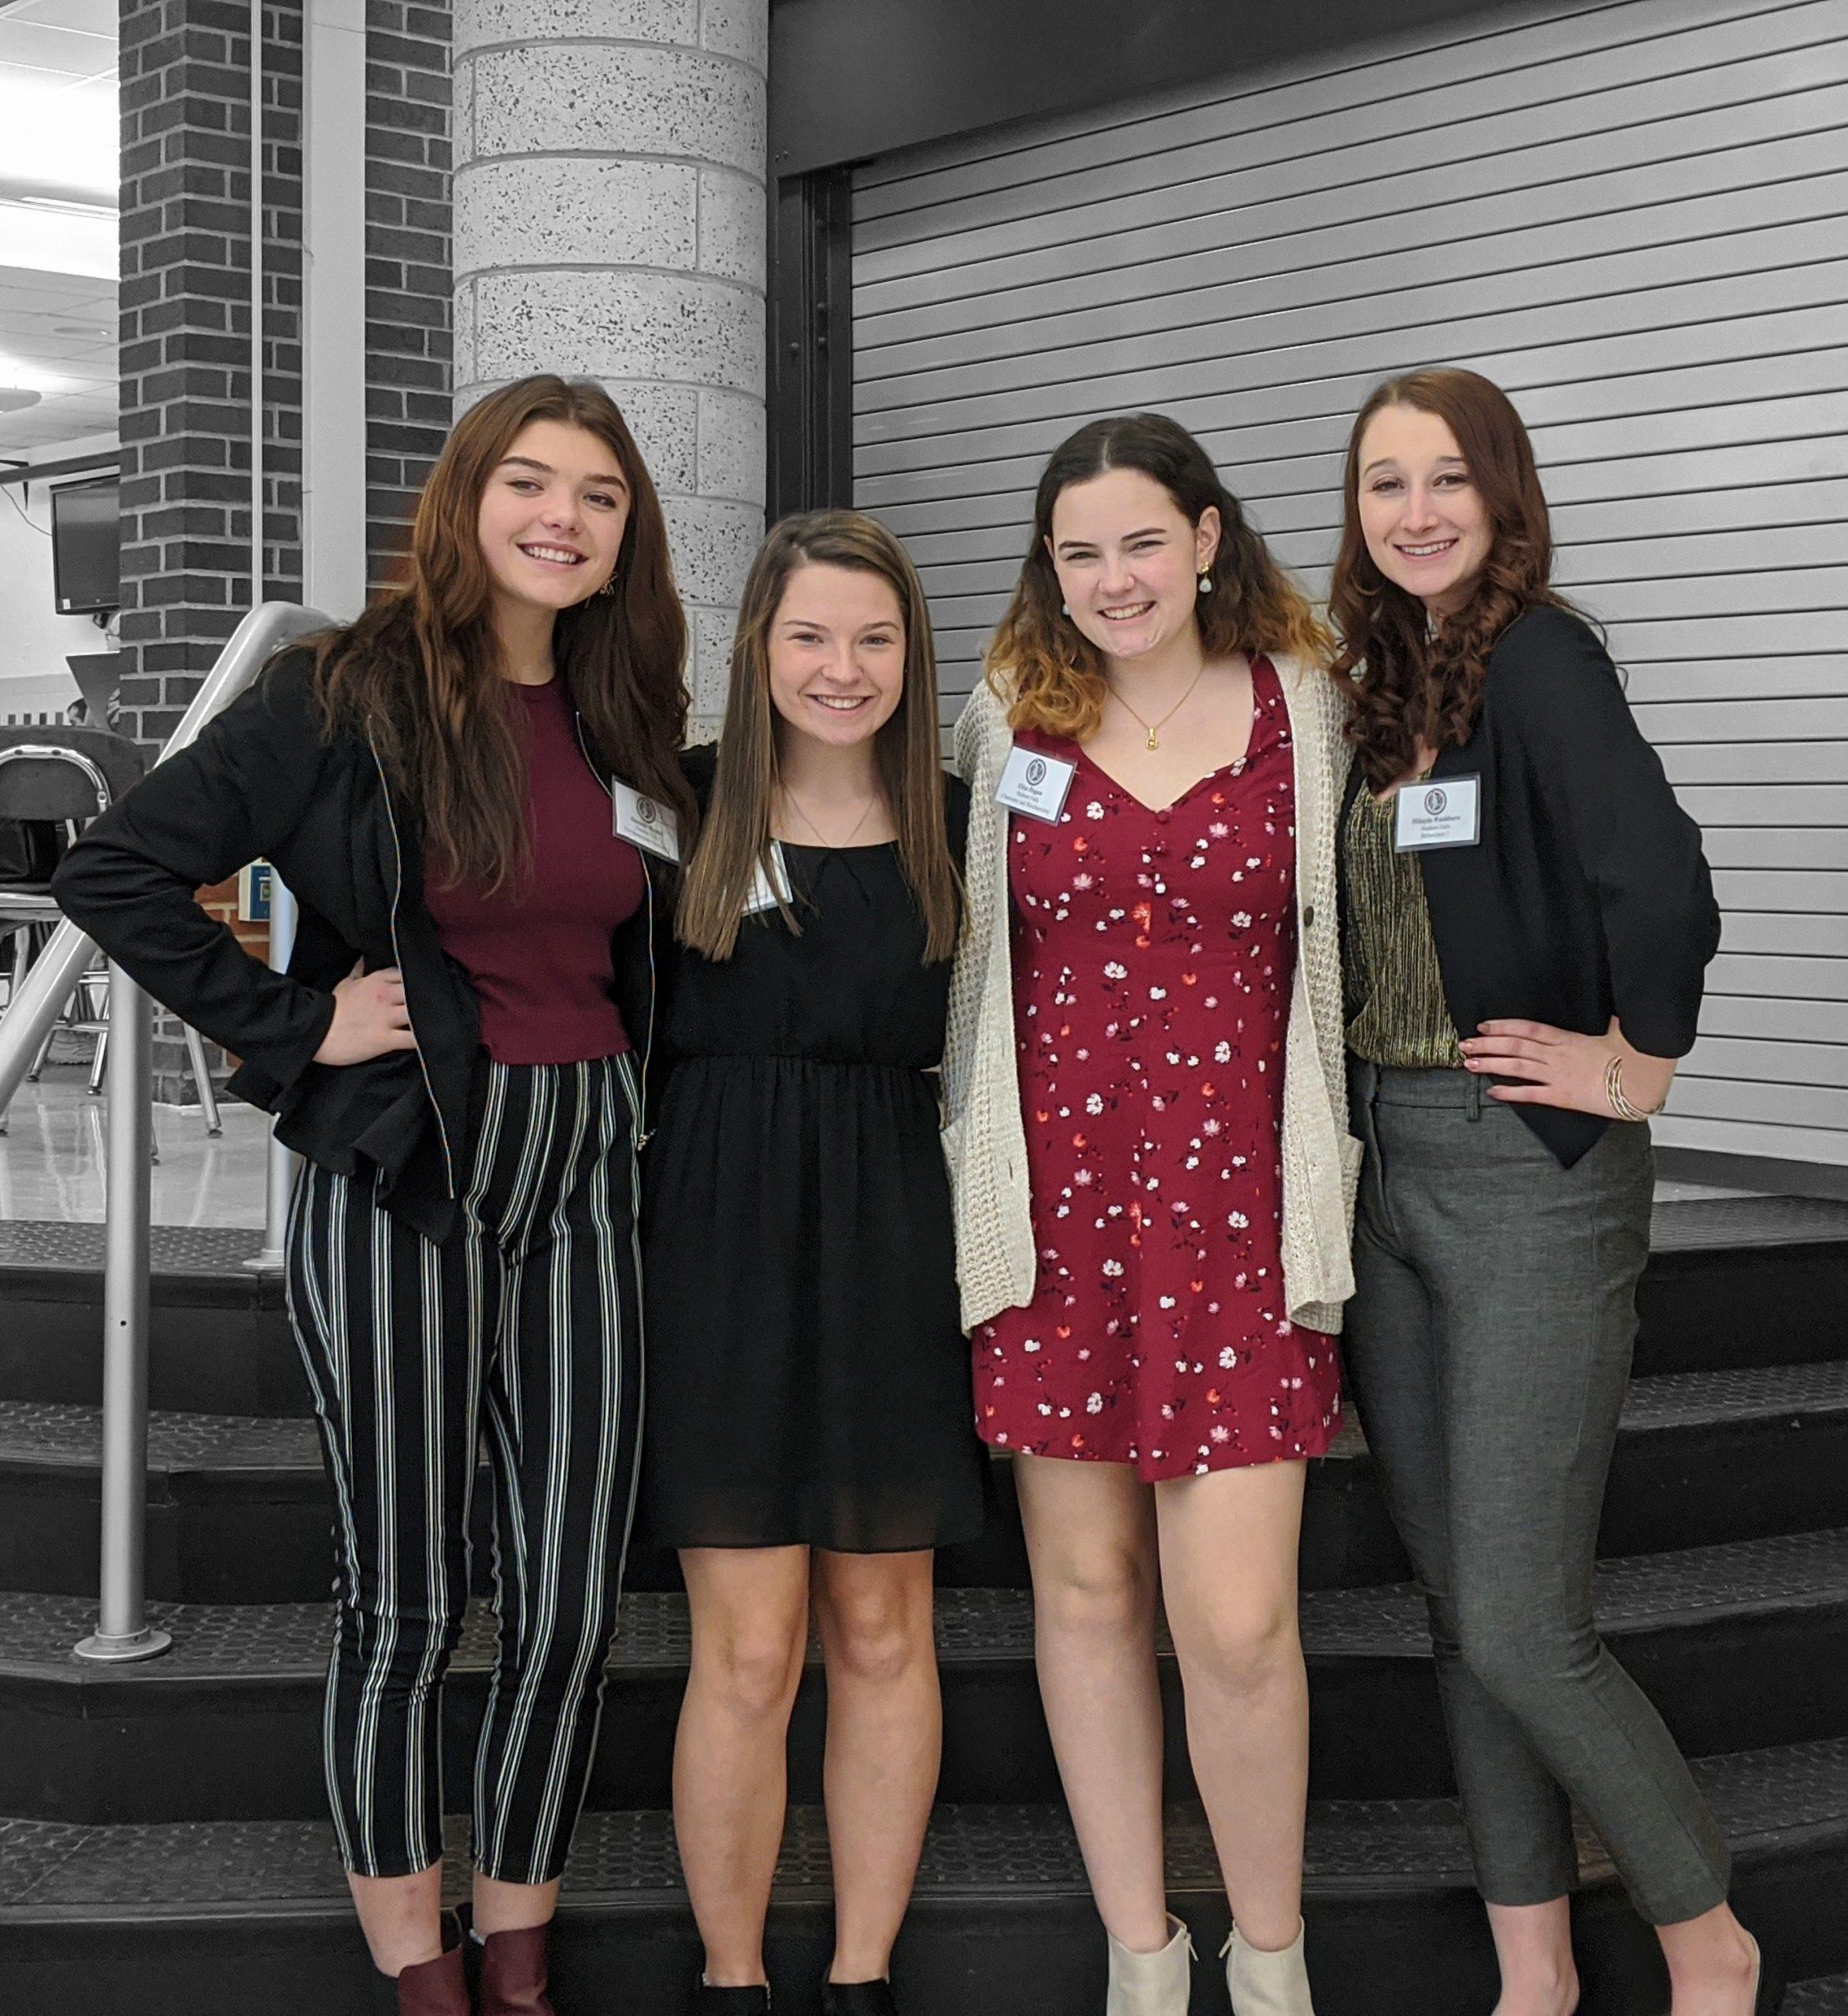 Four GHS Senior girls smile for a photo